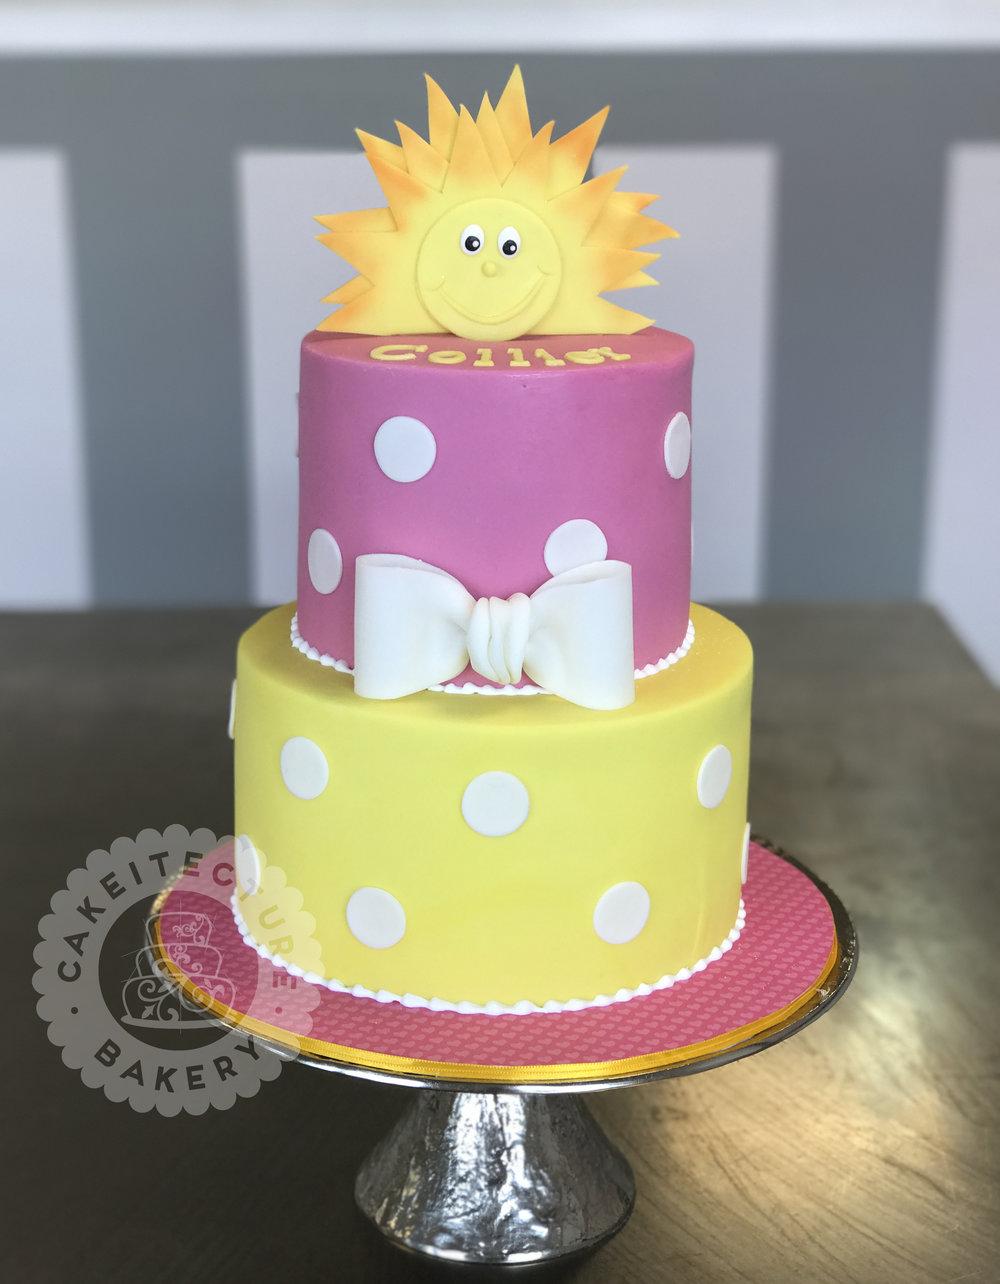 Cakeitecture Bakery 1737 sunshine cake.jpg